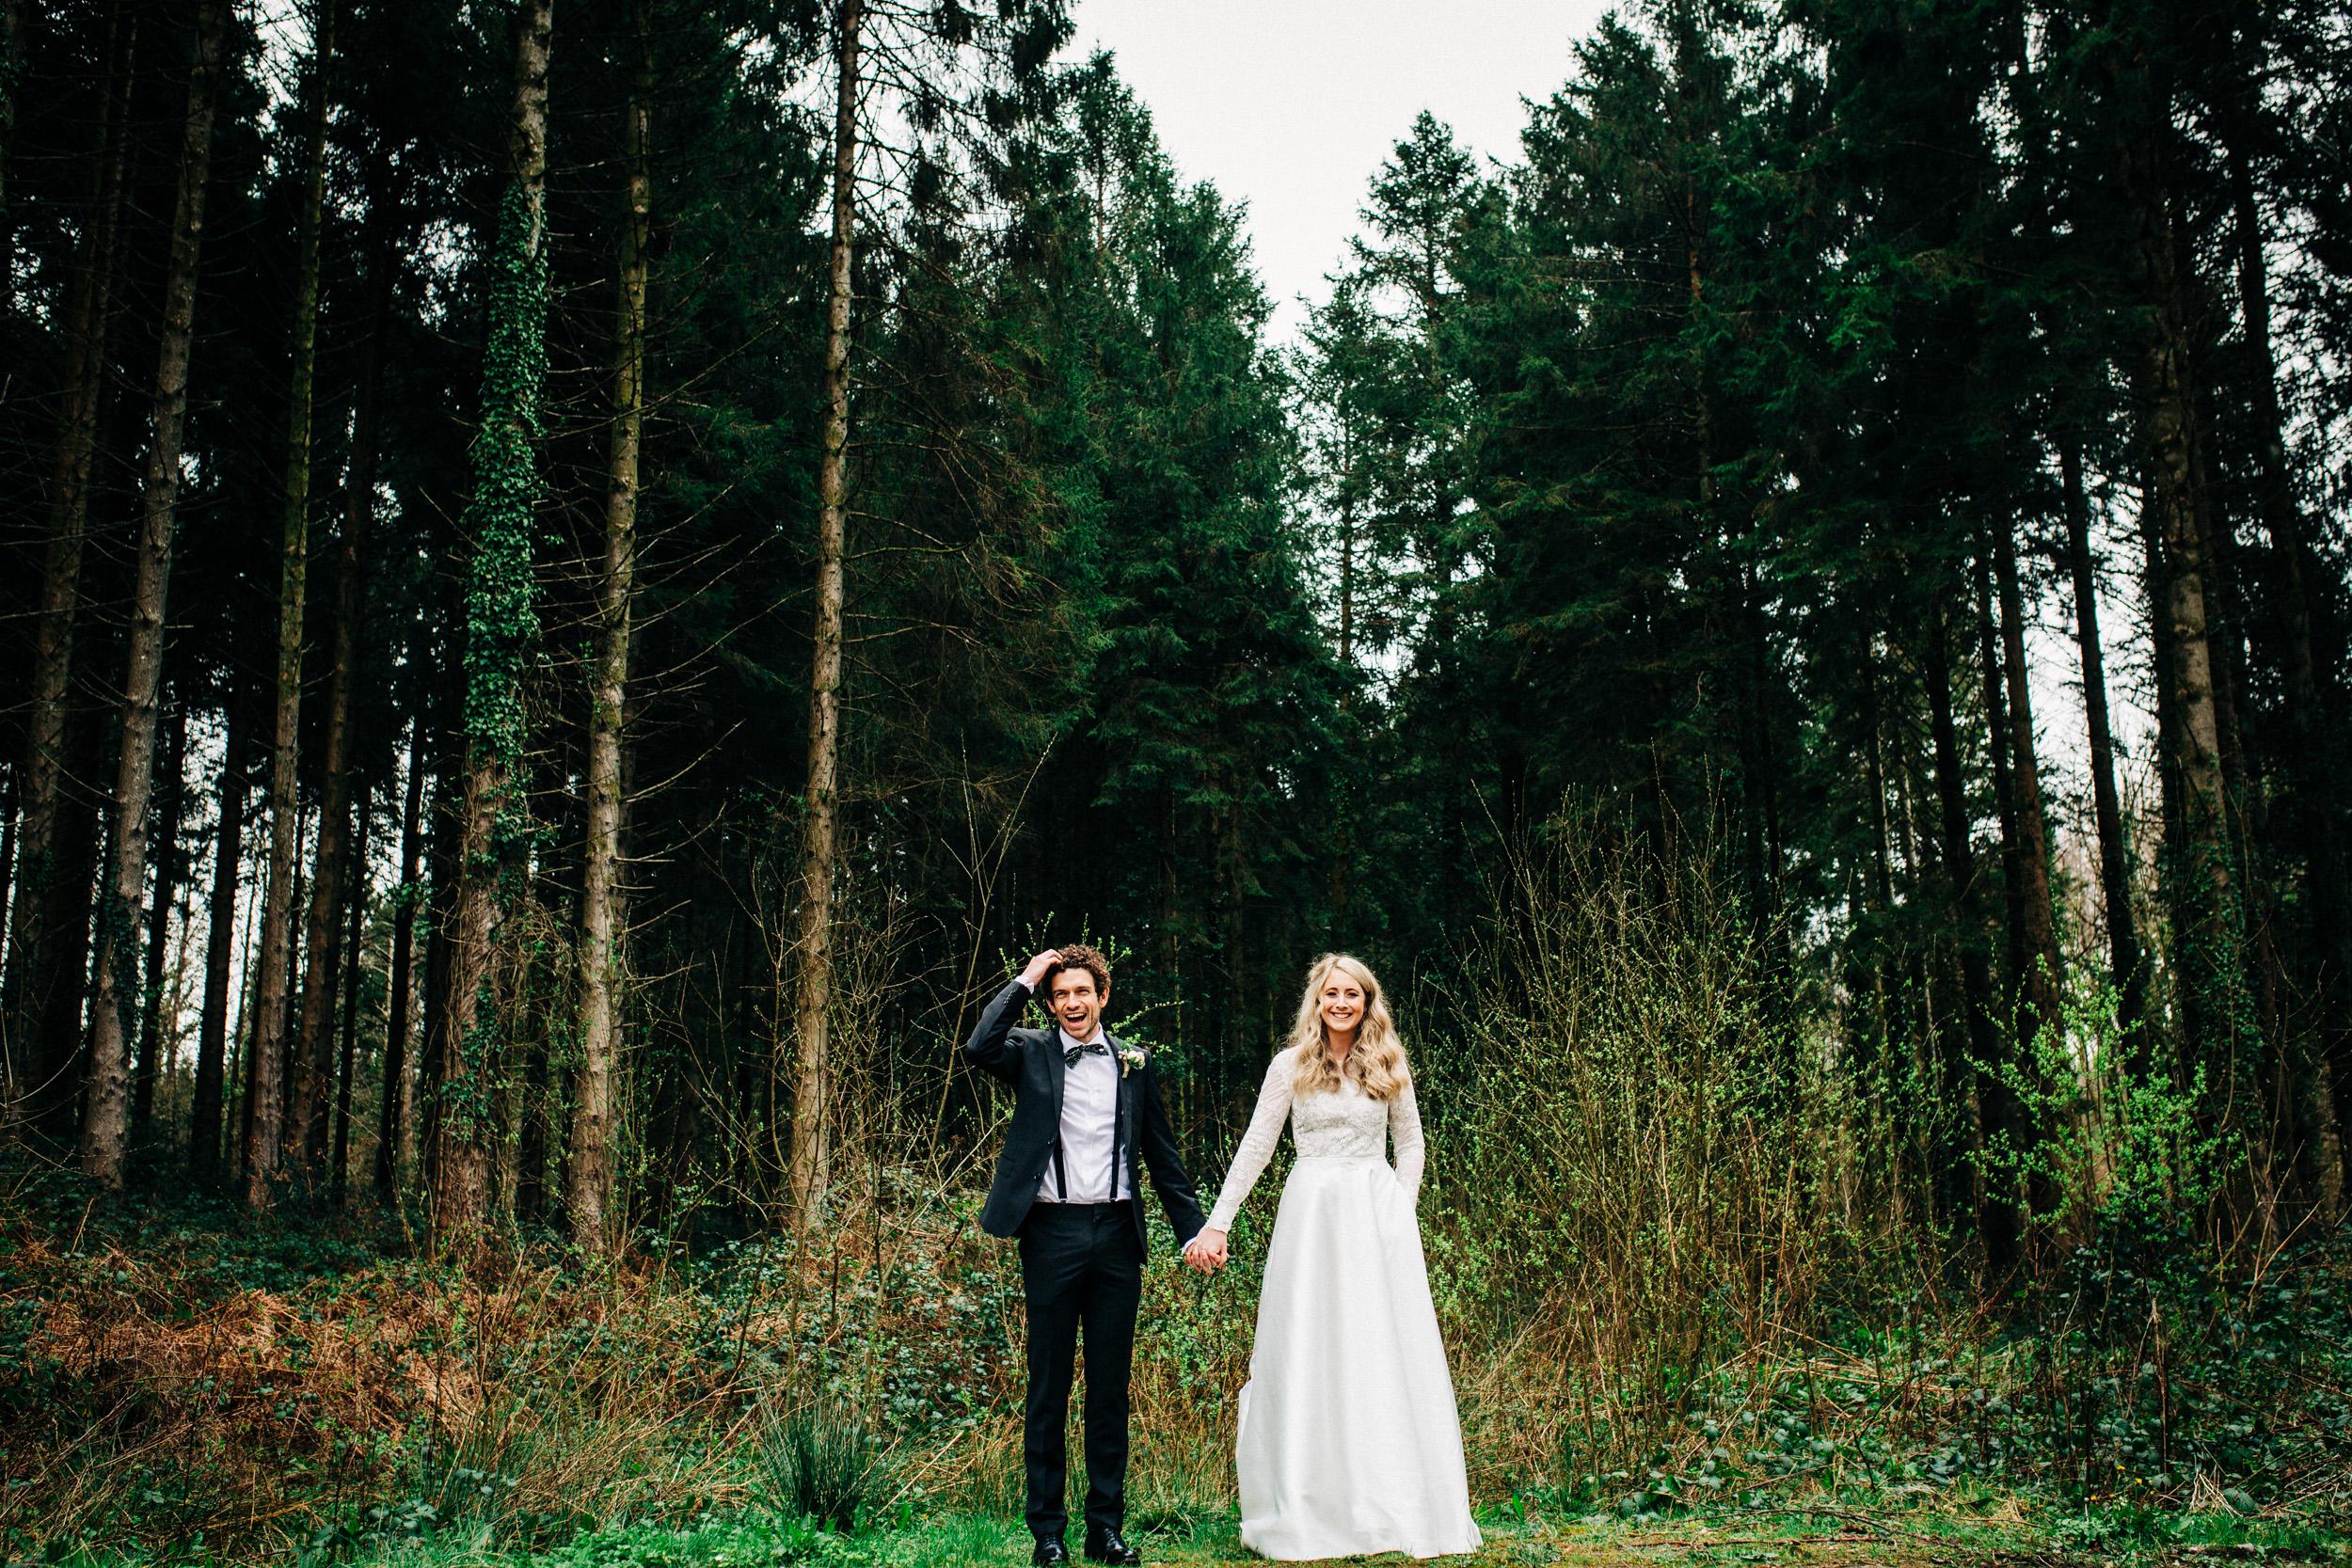 Cardiff Photographer Alex Sedgmond - Photography South Wales - Carmathenshire Wedding Photography-11.jpg